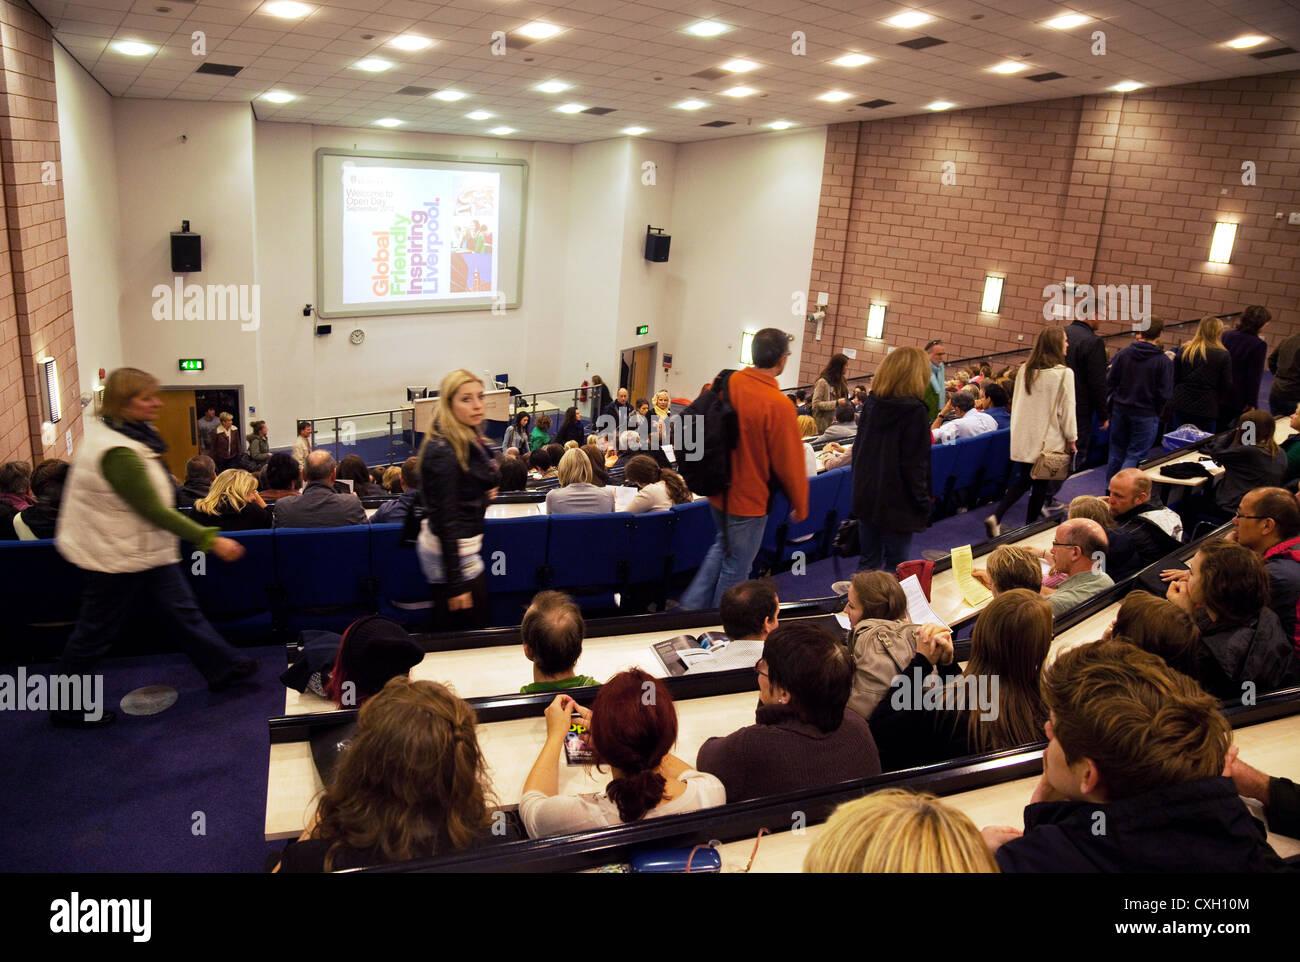 Students attending a lecture, Liverpool University, Merseyside, Lancashire UK - Stock Image